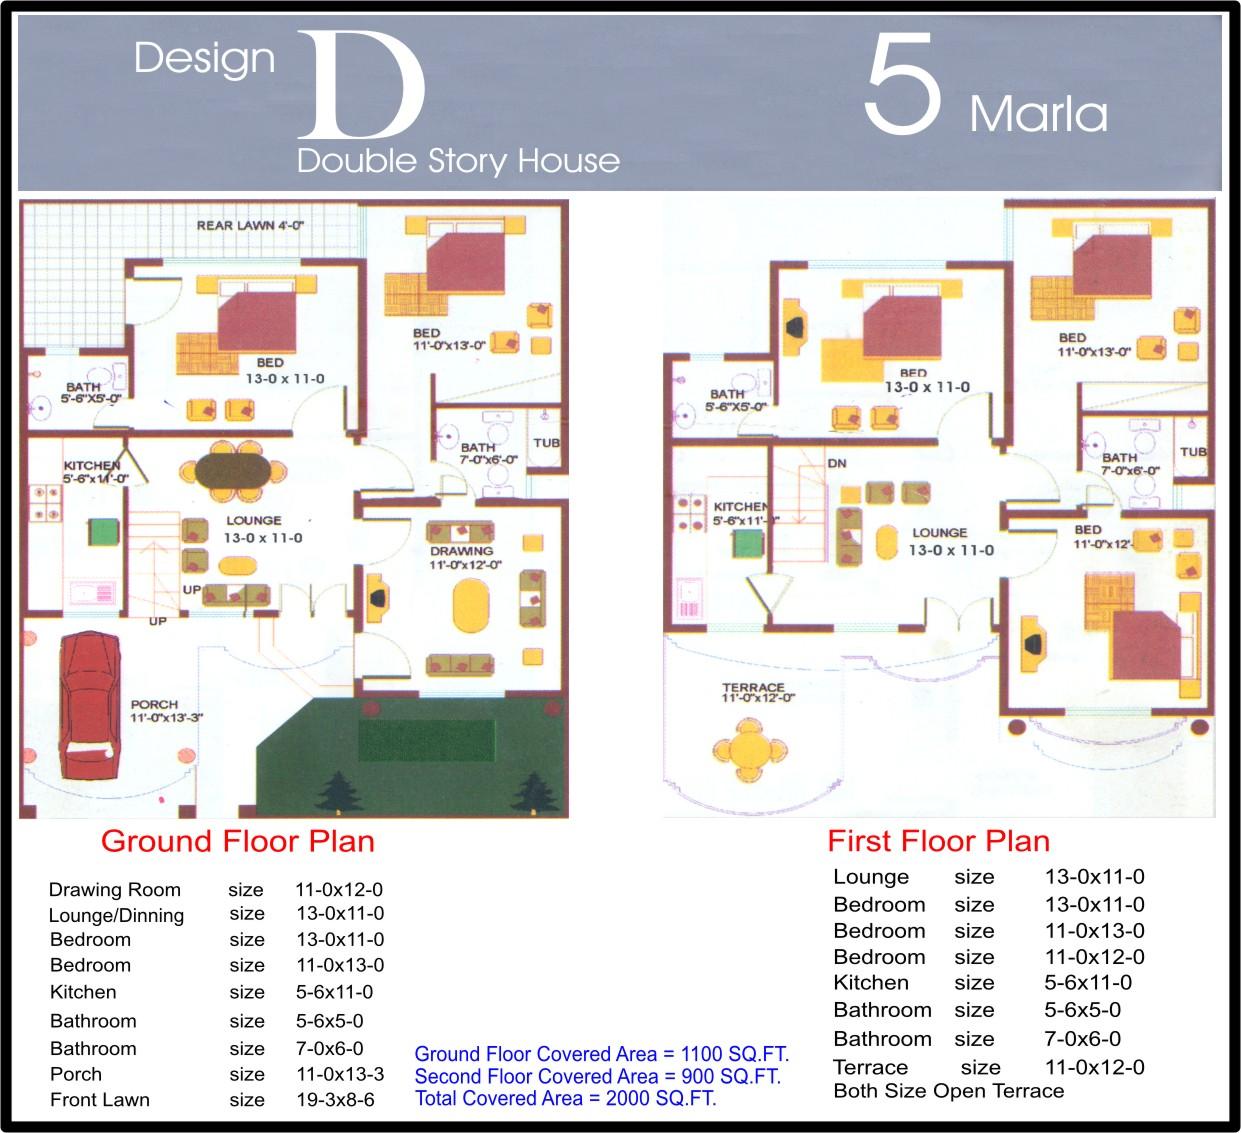 5 Marla Design D Final Civil Engineers Pk